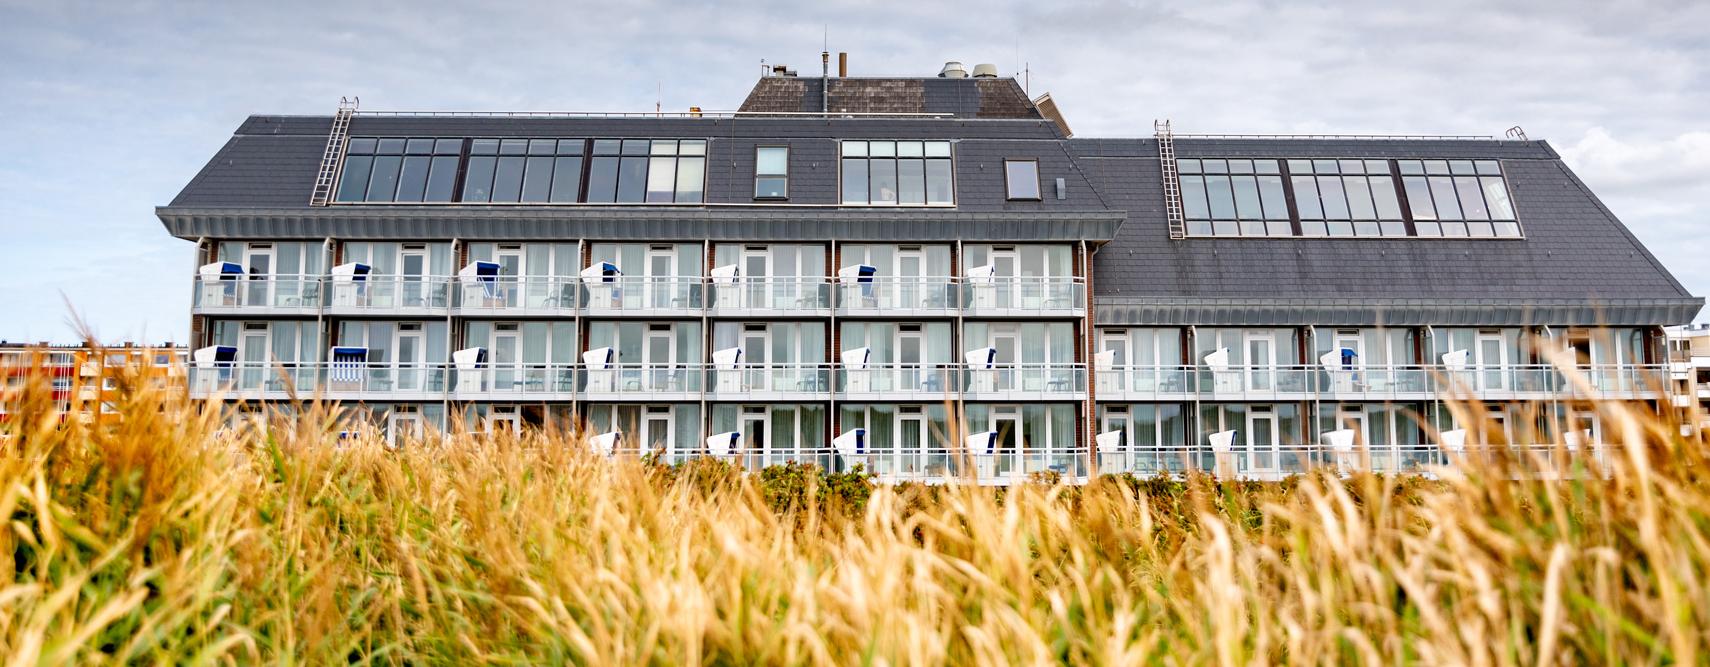 Wyn. Strandhotel Sylt in Westerland am Strand hinter den Dünen